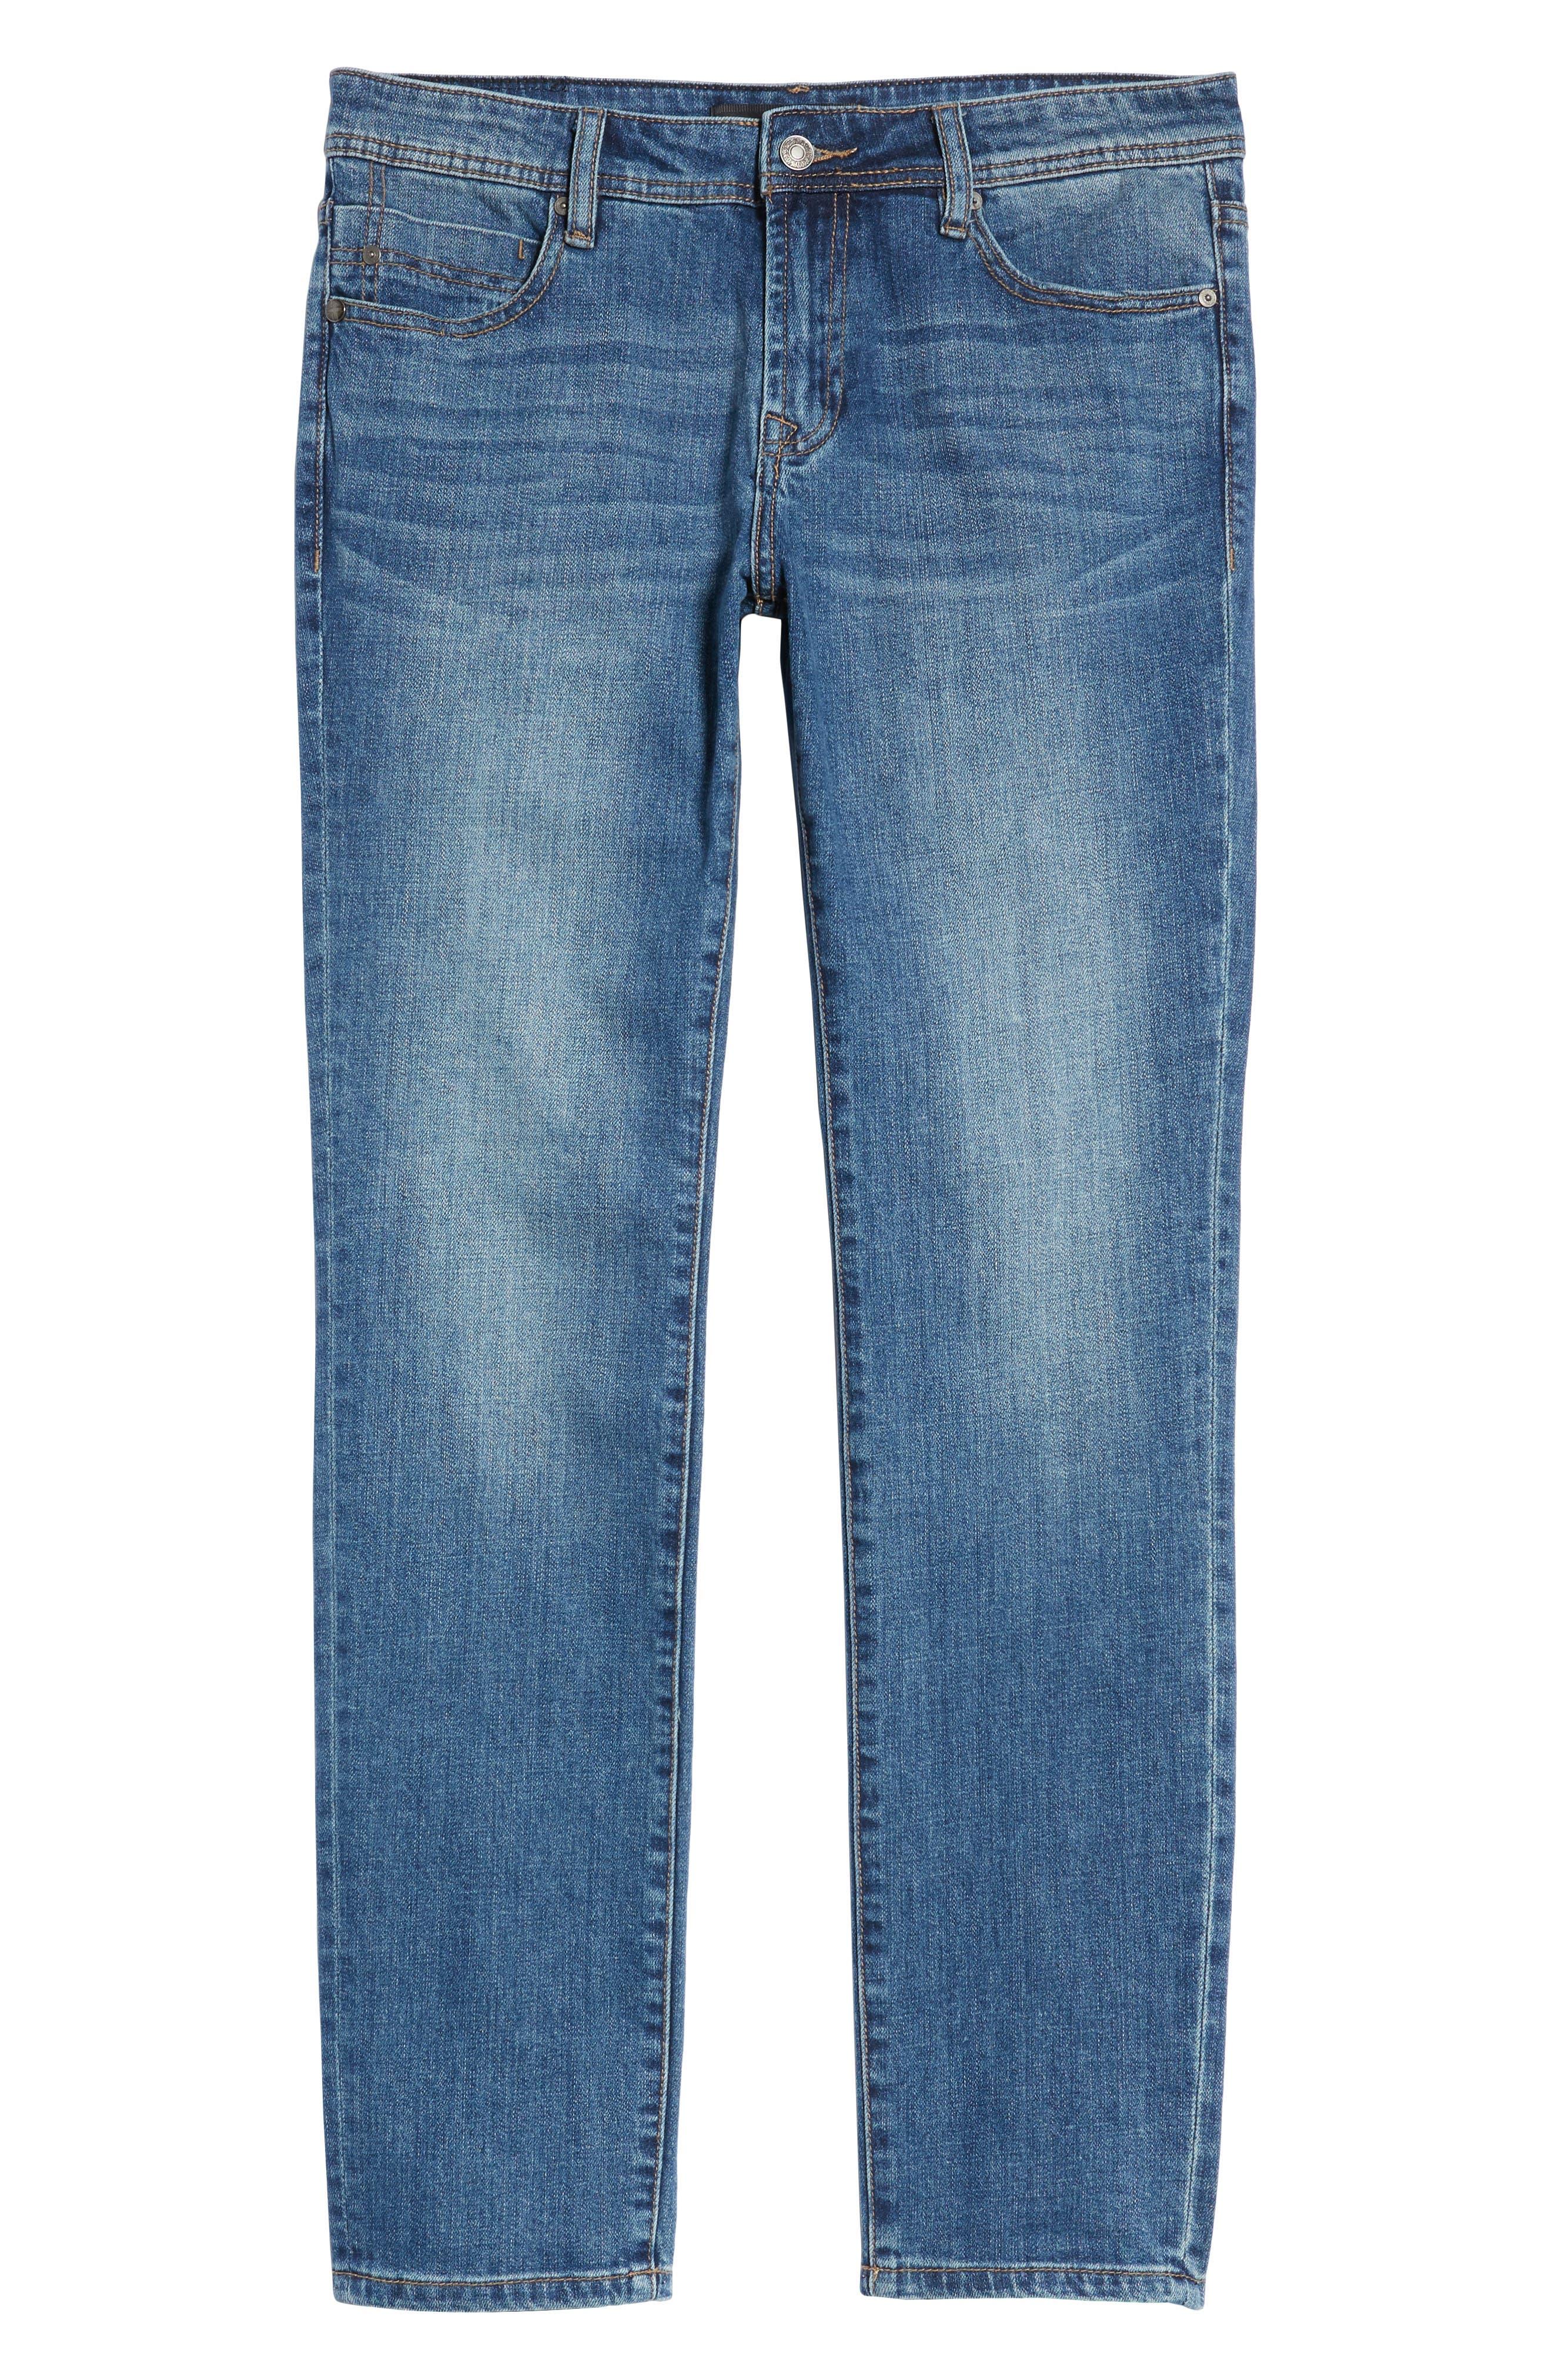 Jeans Co. Bond Skinny Fit Jeans,                             Alternate thumbnail 6, color,                             Bryson Vintage Medium